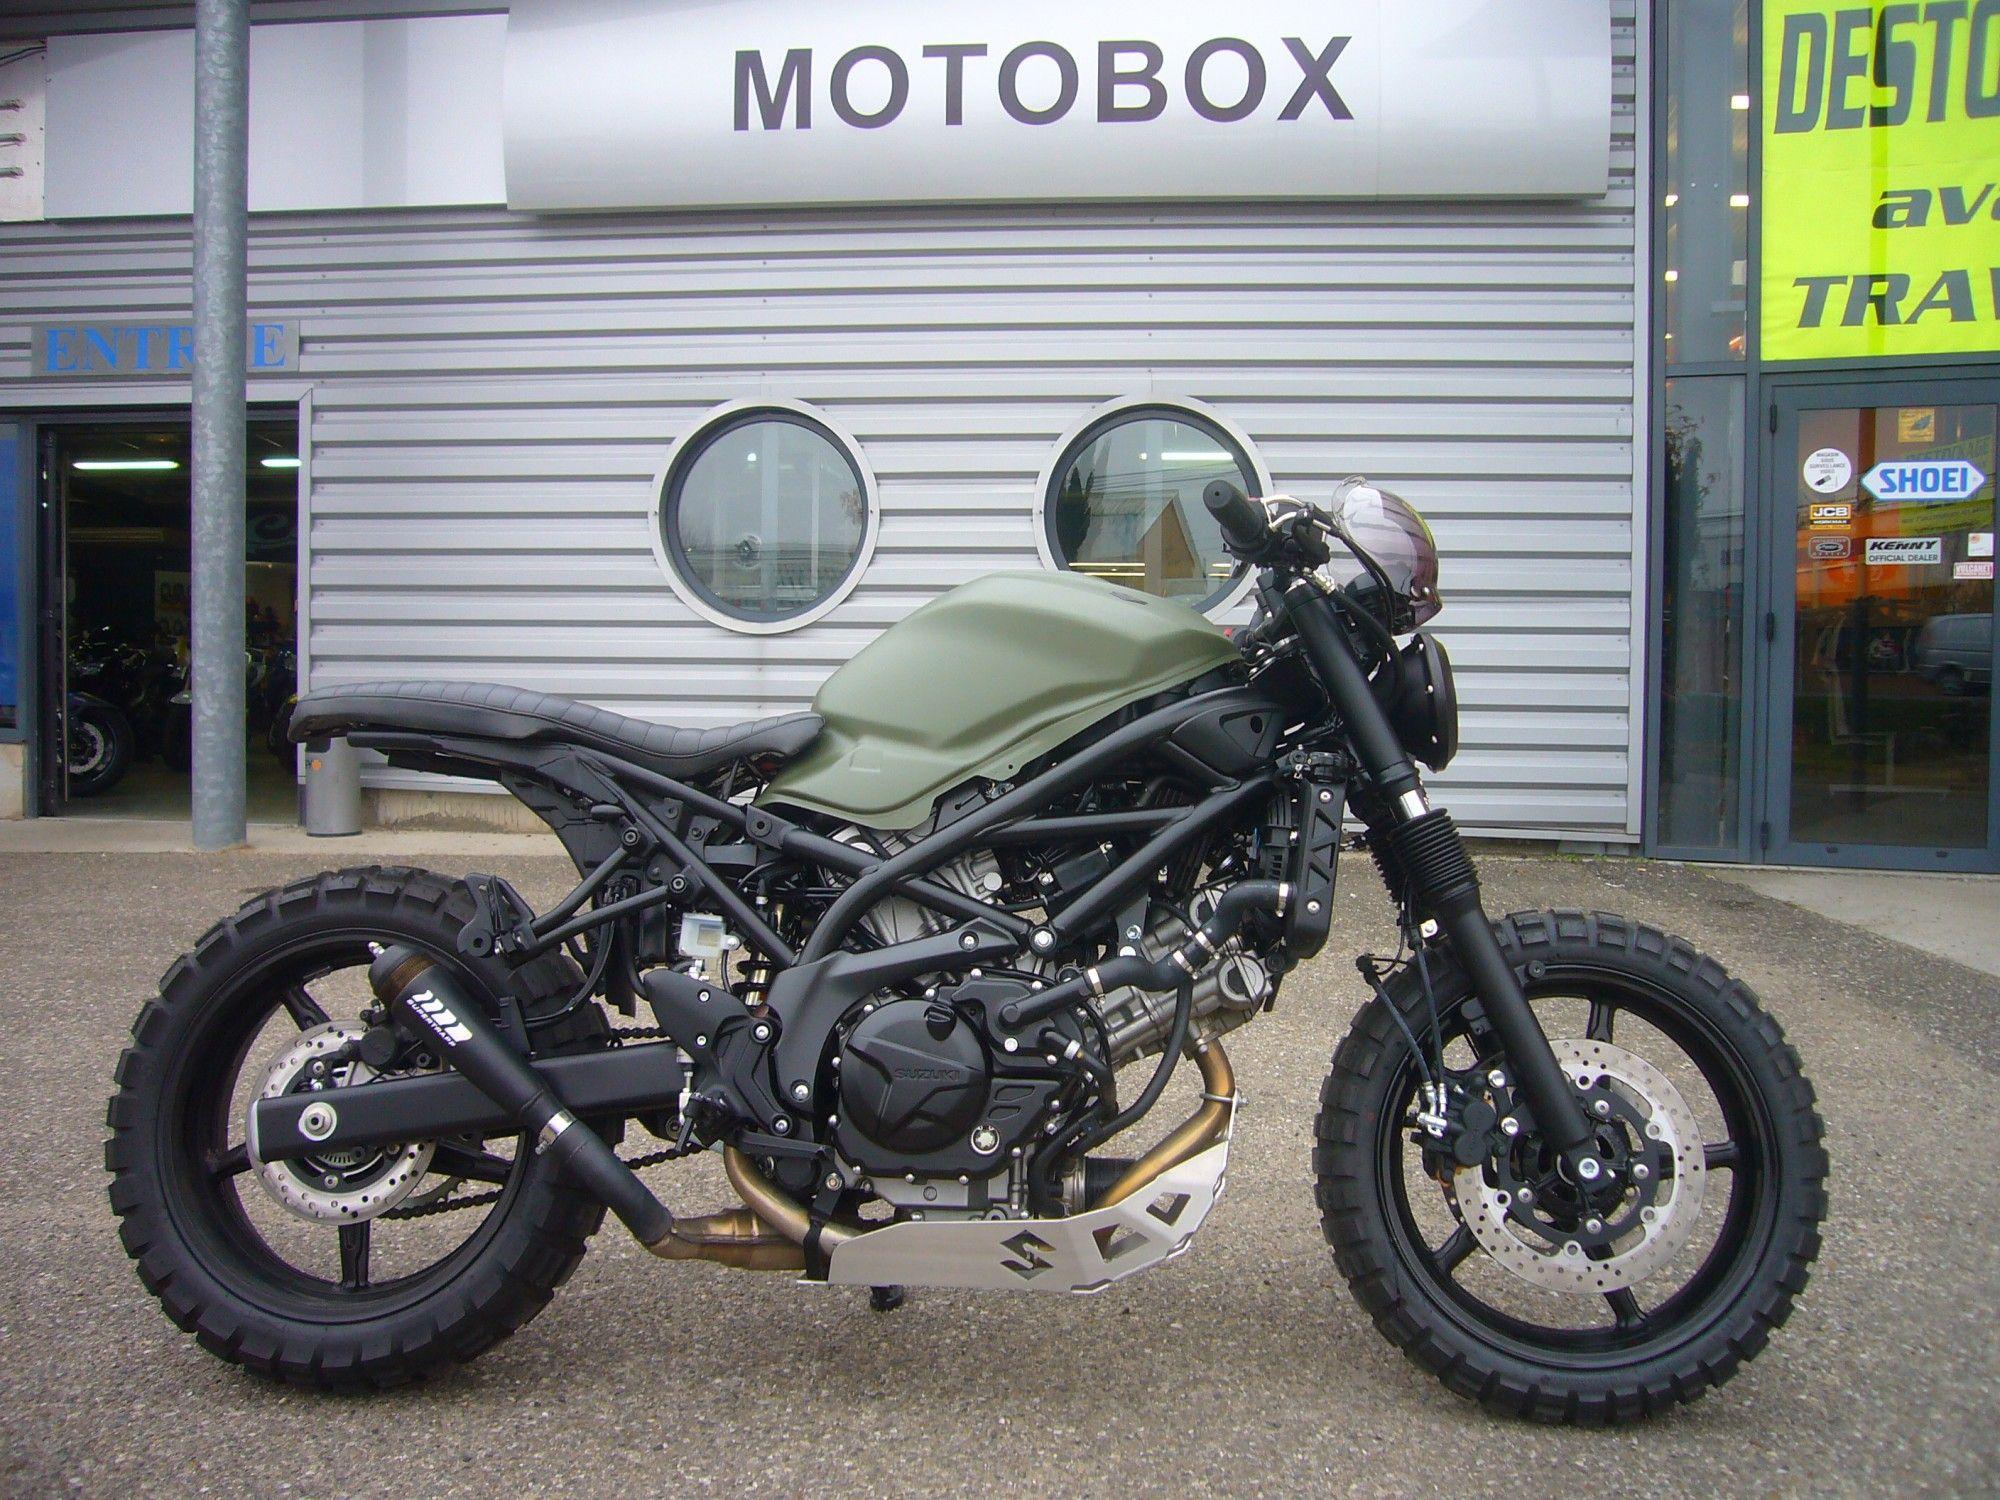 photo annonce suzuki sv 650 kaki mat scrambler motobox 1 052106 jpg 2000 1500 moto pinterest. Black Bedroom Furniture Sets. Home Design Ideas